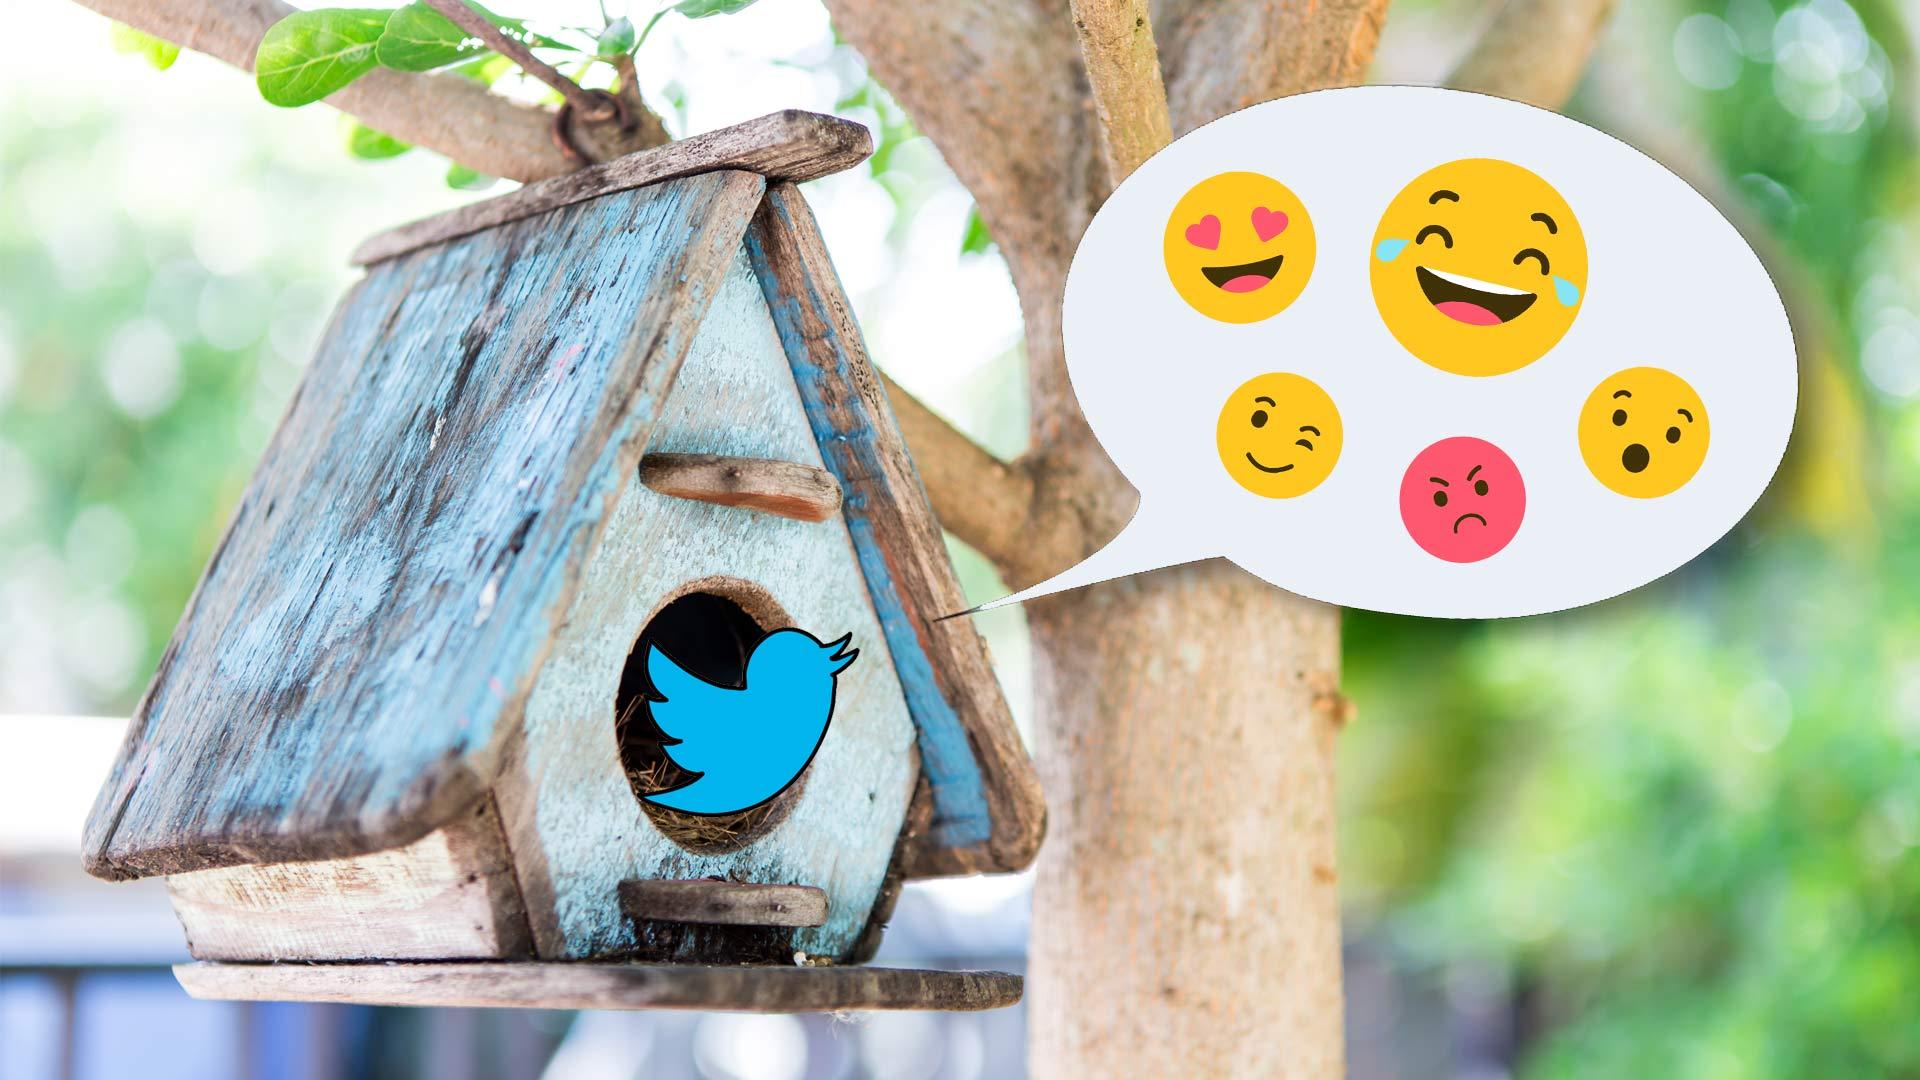 I vantaggi della Sentiment Analysis su Twitter